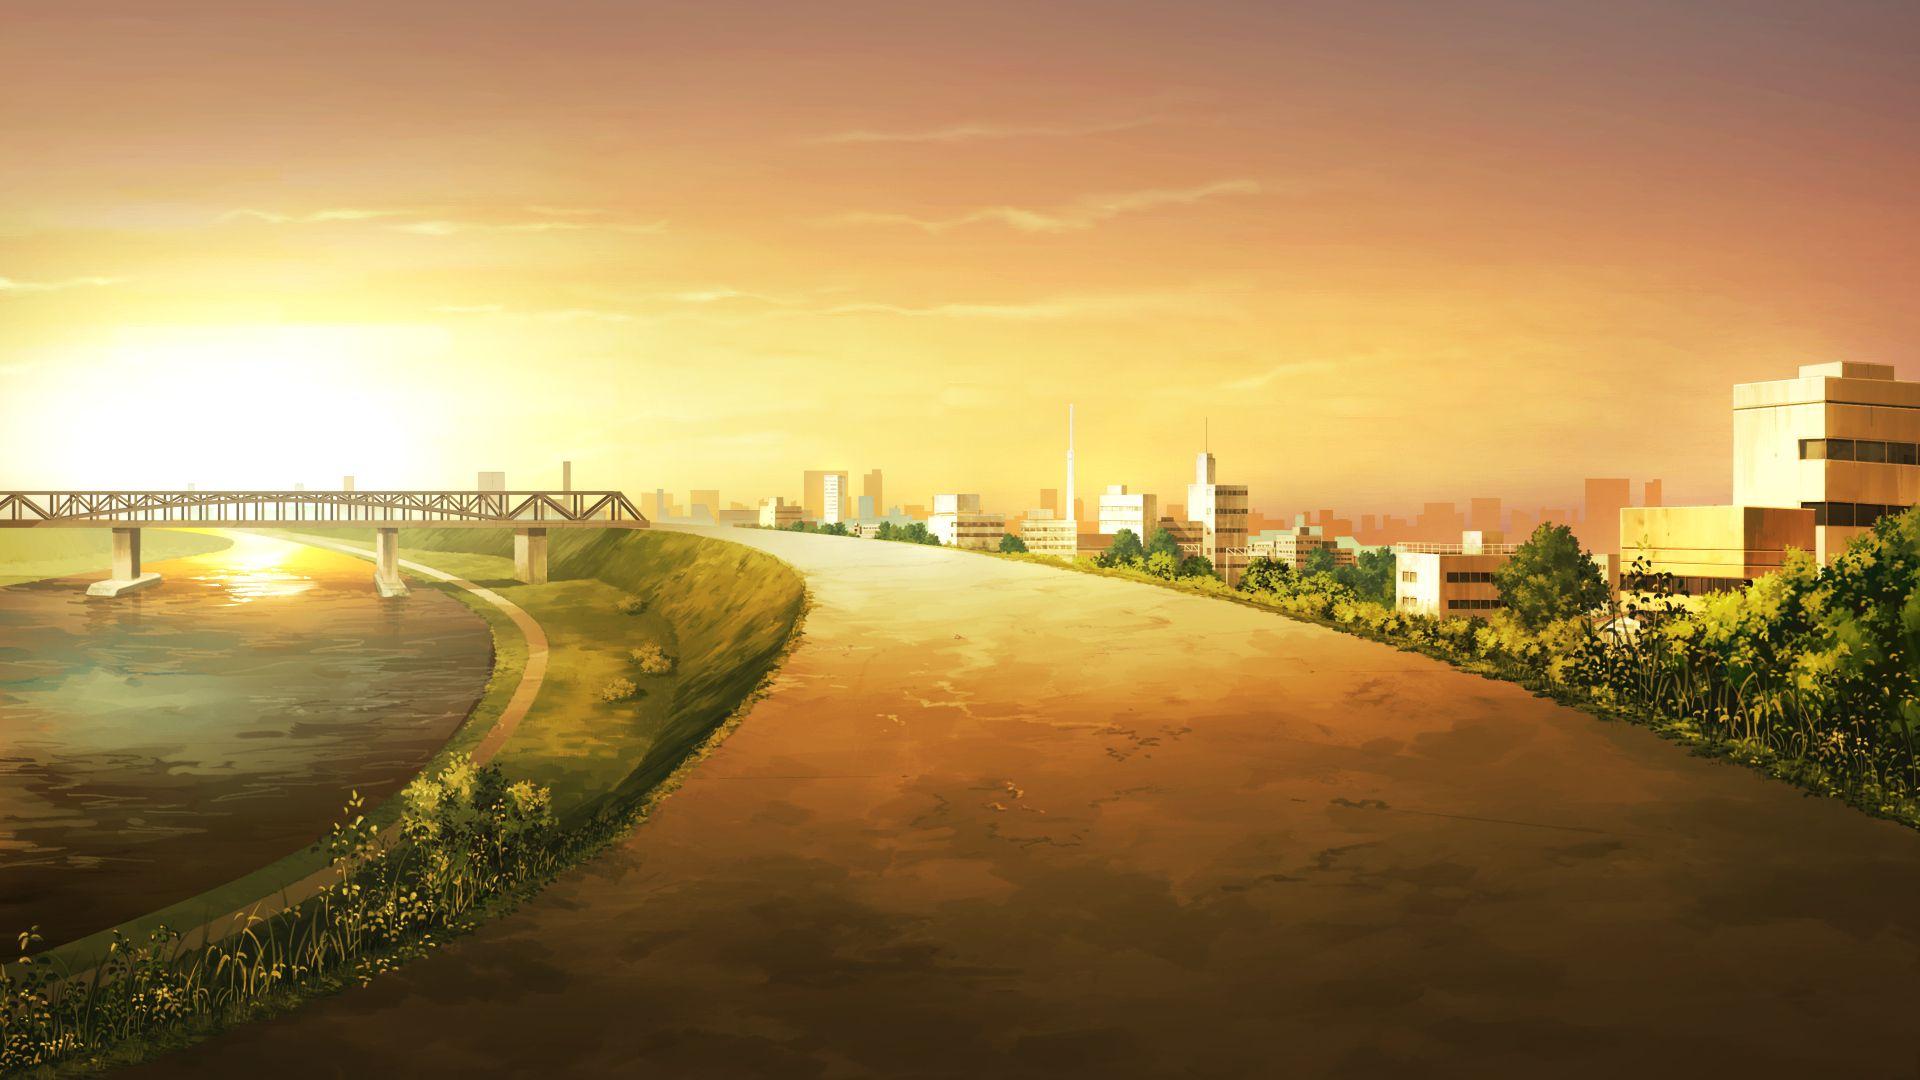 Anime Scenery wallpaper Anime scenery